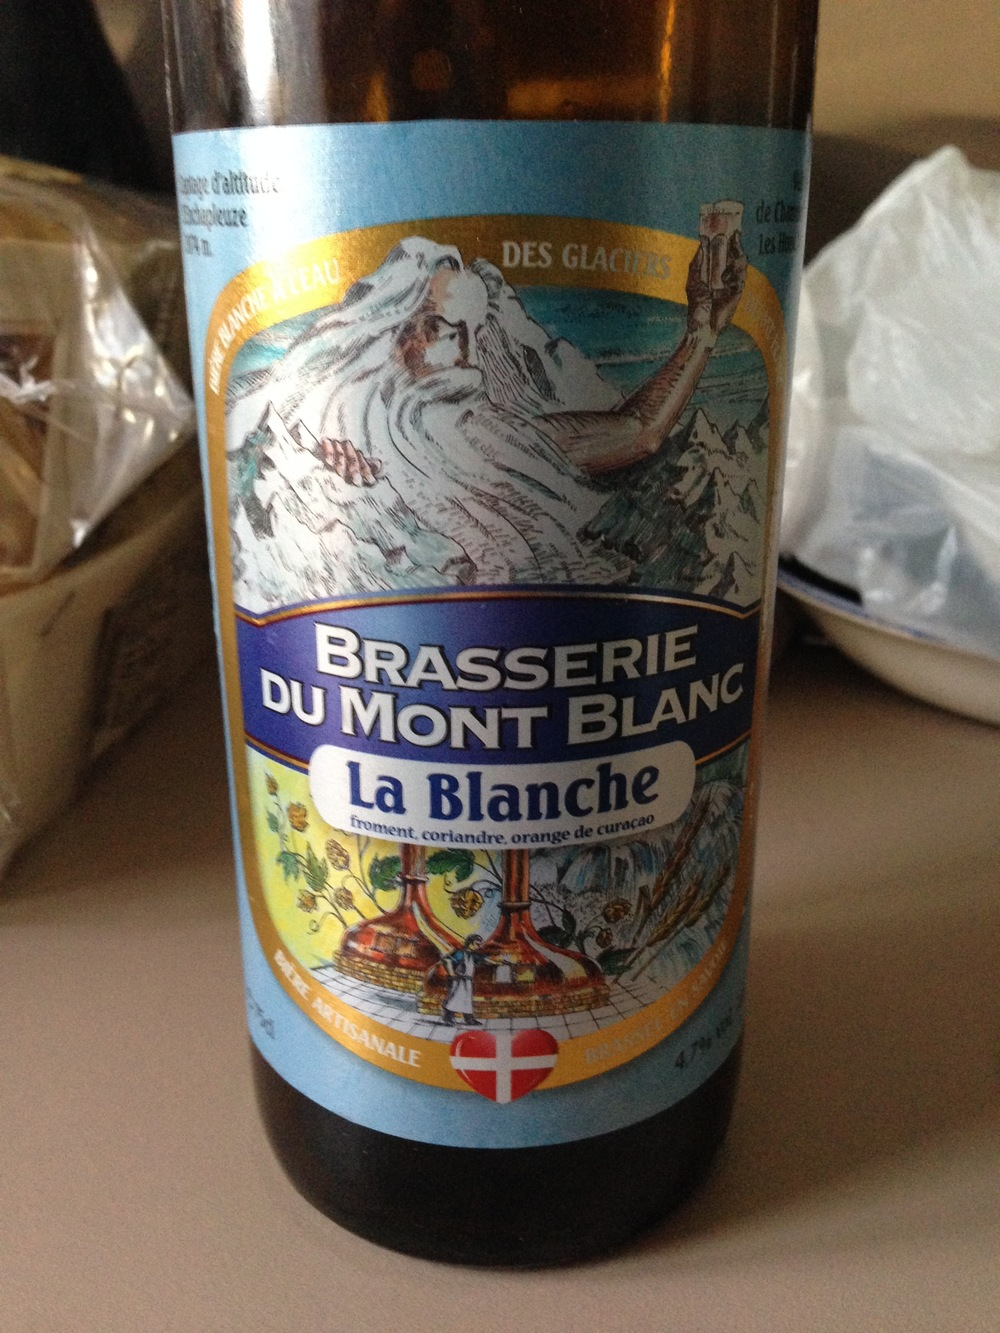 brasserie mont blanc 28 images les bi 233 res 224 chamb 233 ry et haute savoie a guide to